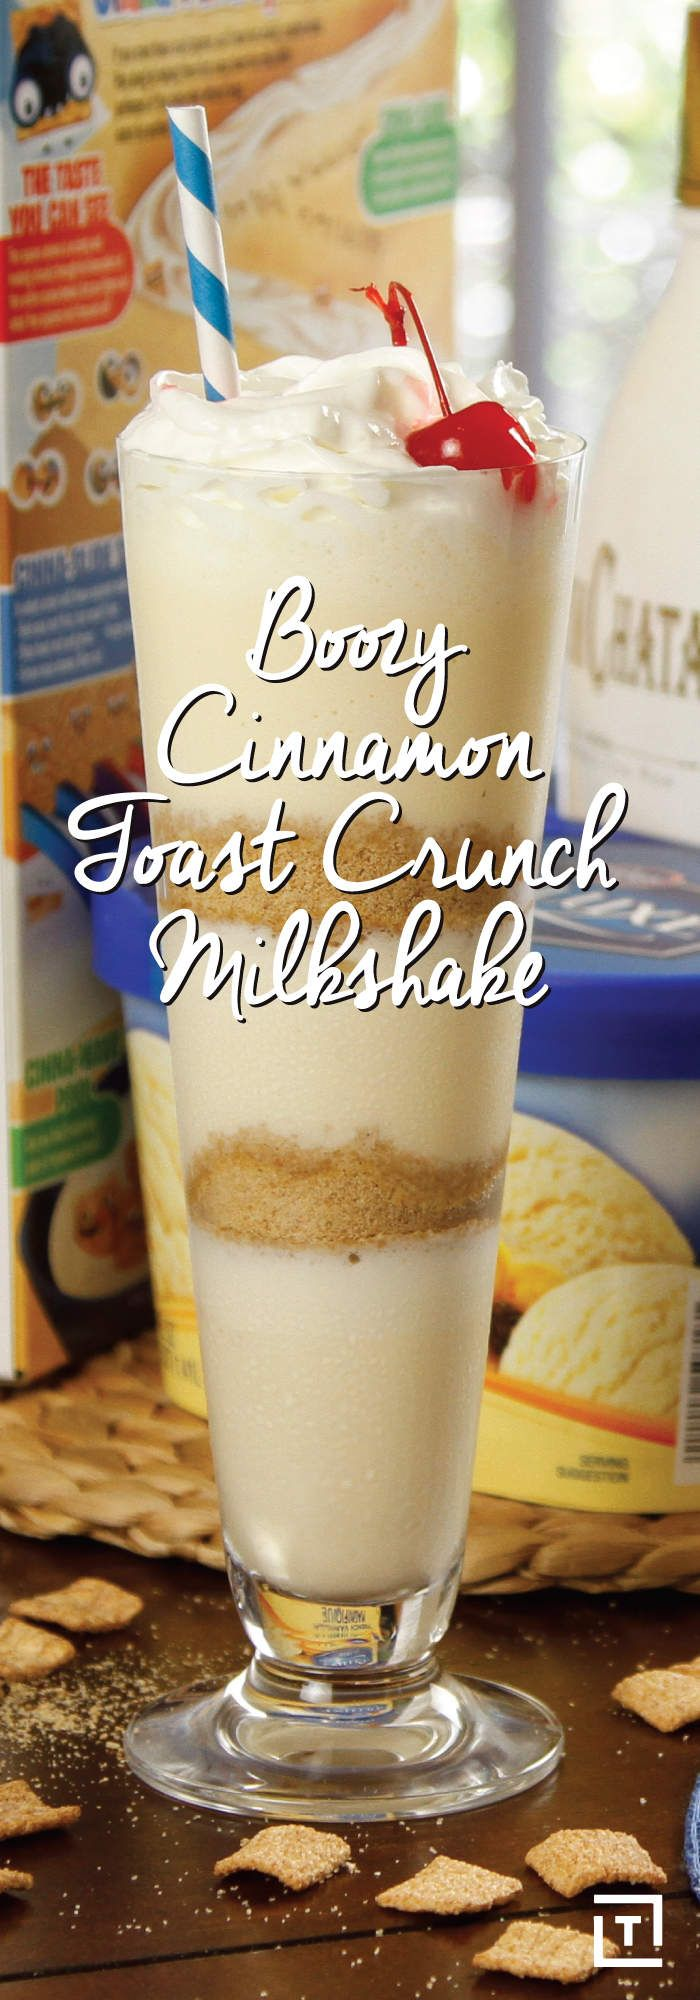 This Boozy Cinnamon Toast Crunch Milkshake Is Both Breakfast and Dessert